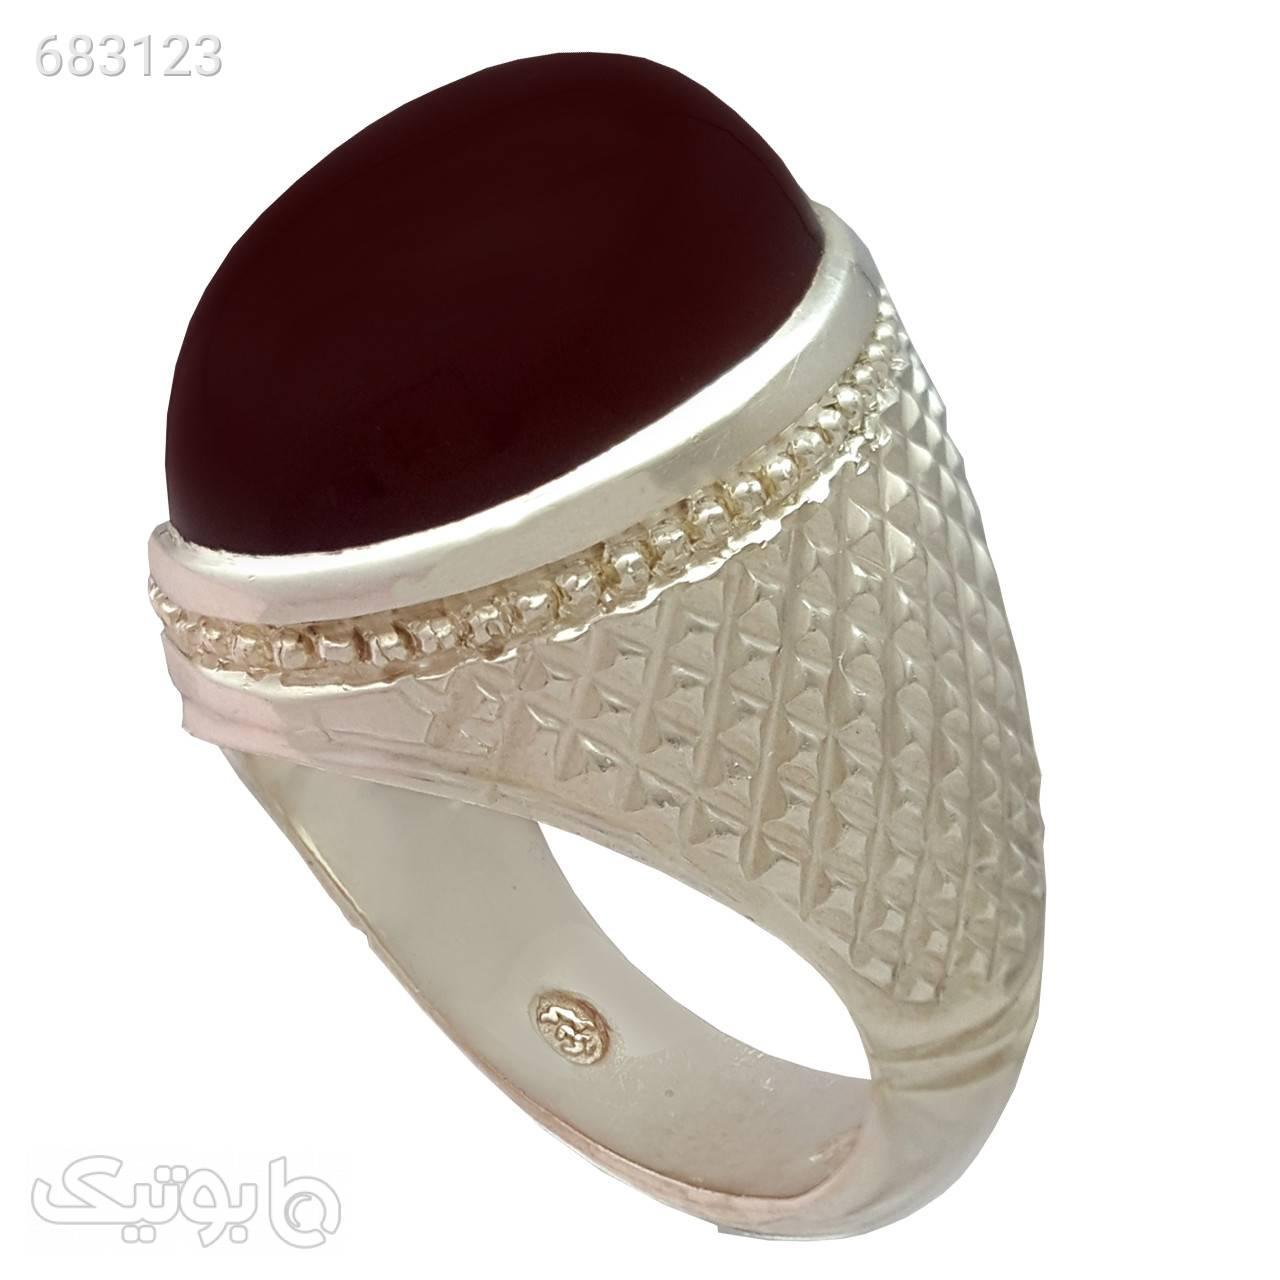 انگشتر نقره مردانه مدل a480jw نقره ای انگشتر